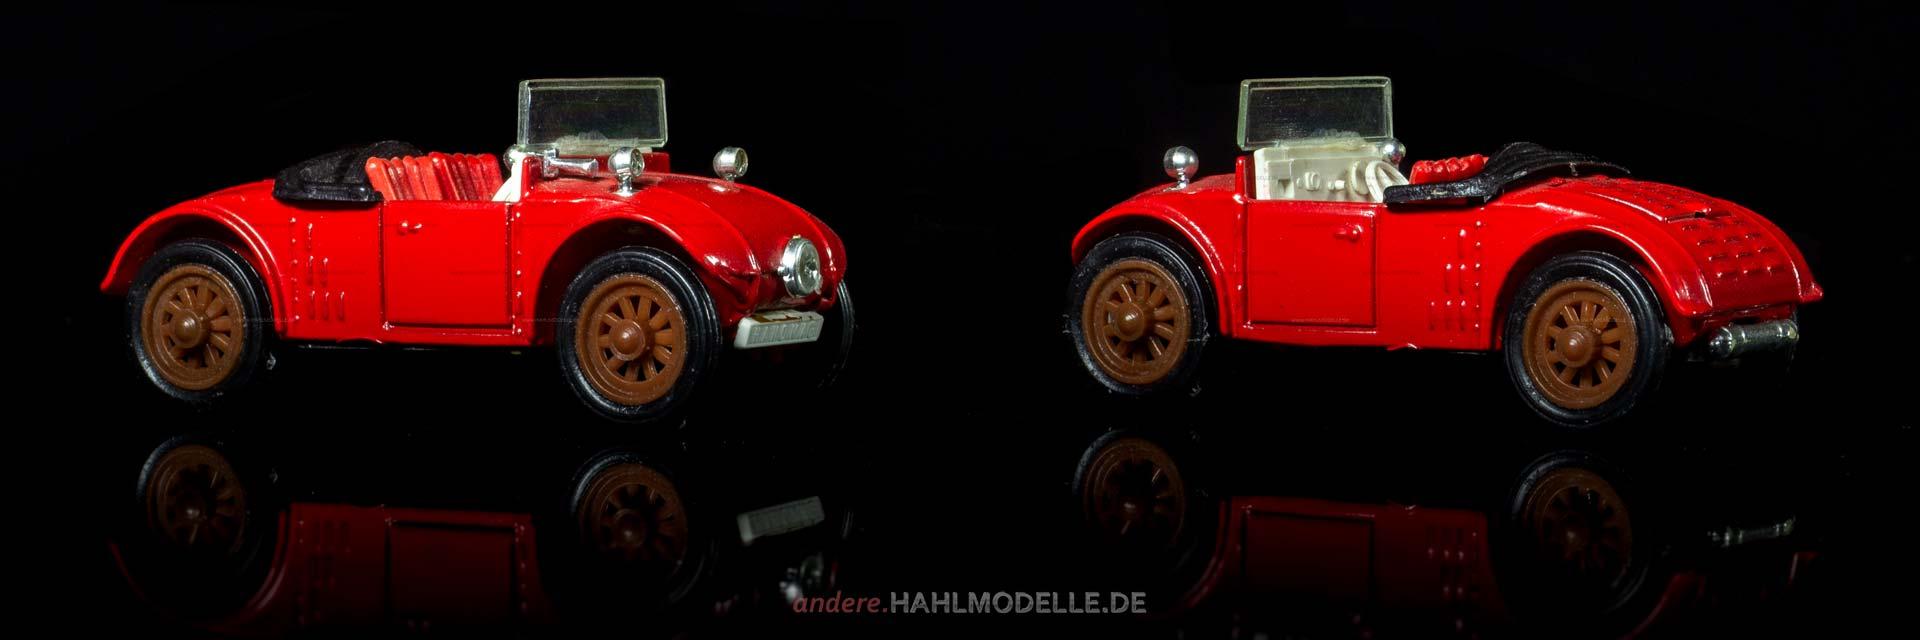 "Hanomag 2/10 PS ""Kommissbrot"" | Cabriolet | RW-Modell | 1:43 | www.andere.hahlmodelle.de"